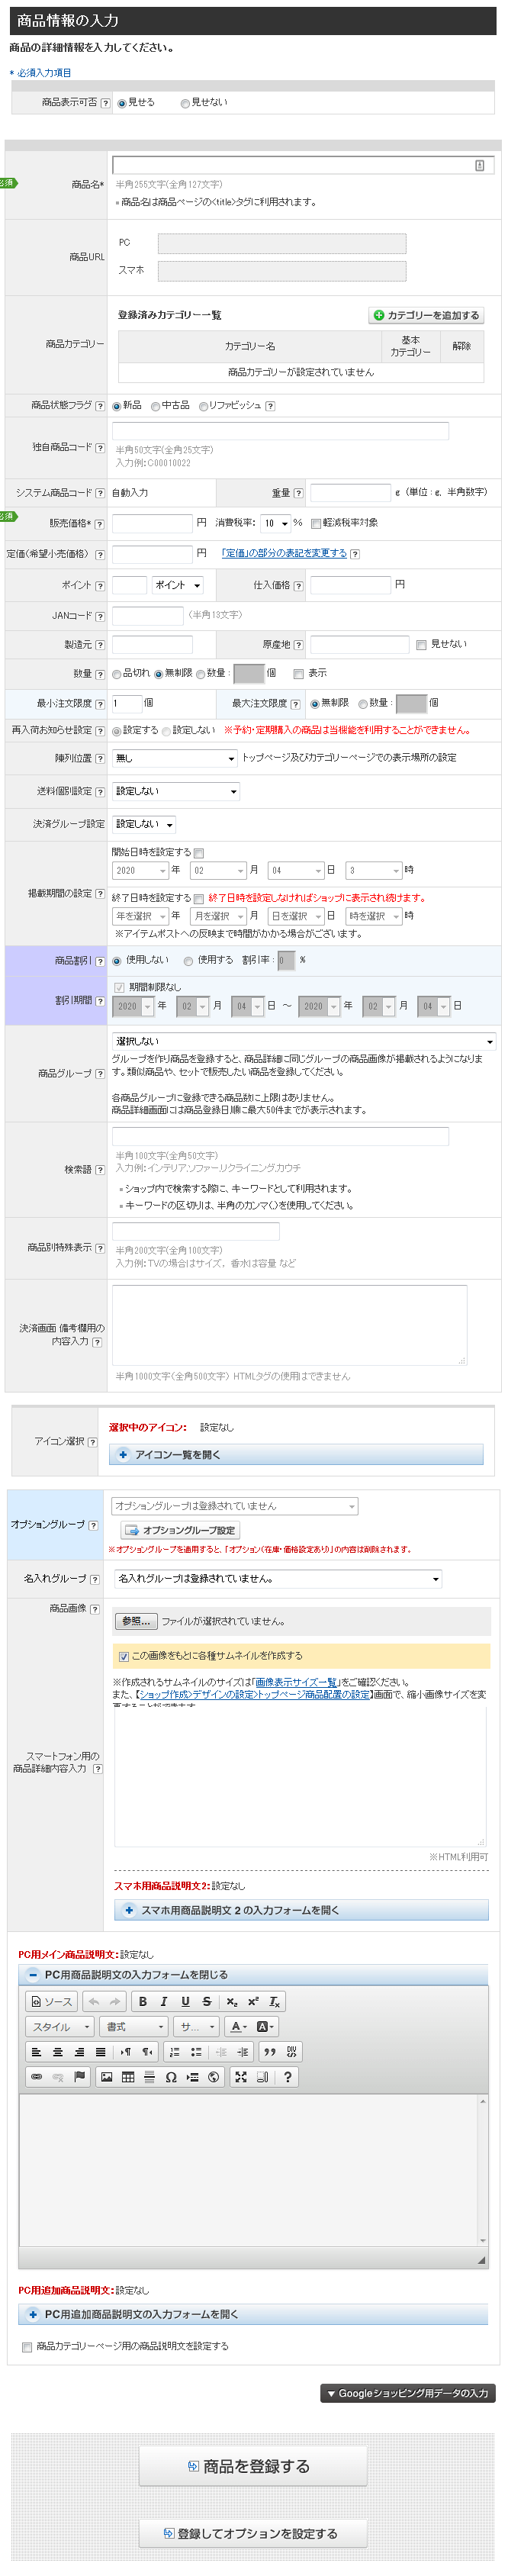 MakeShopの商品登録画面